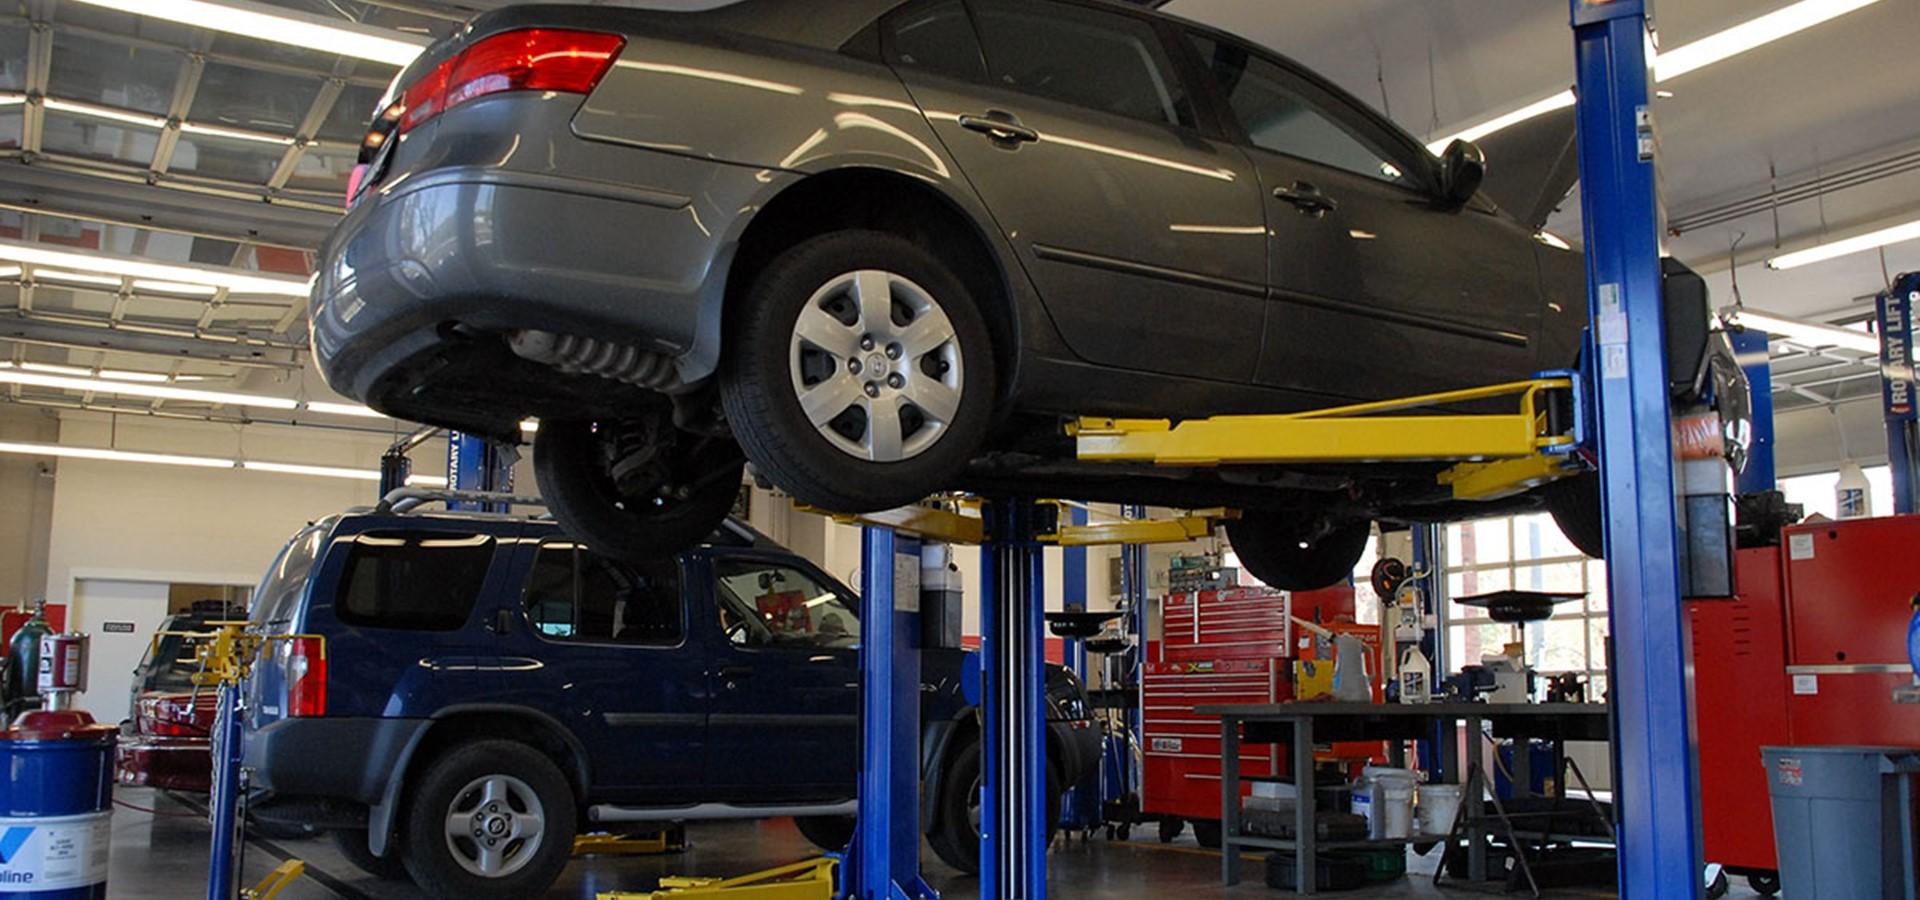 A car on a hoist in a garage